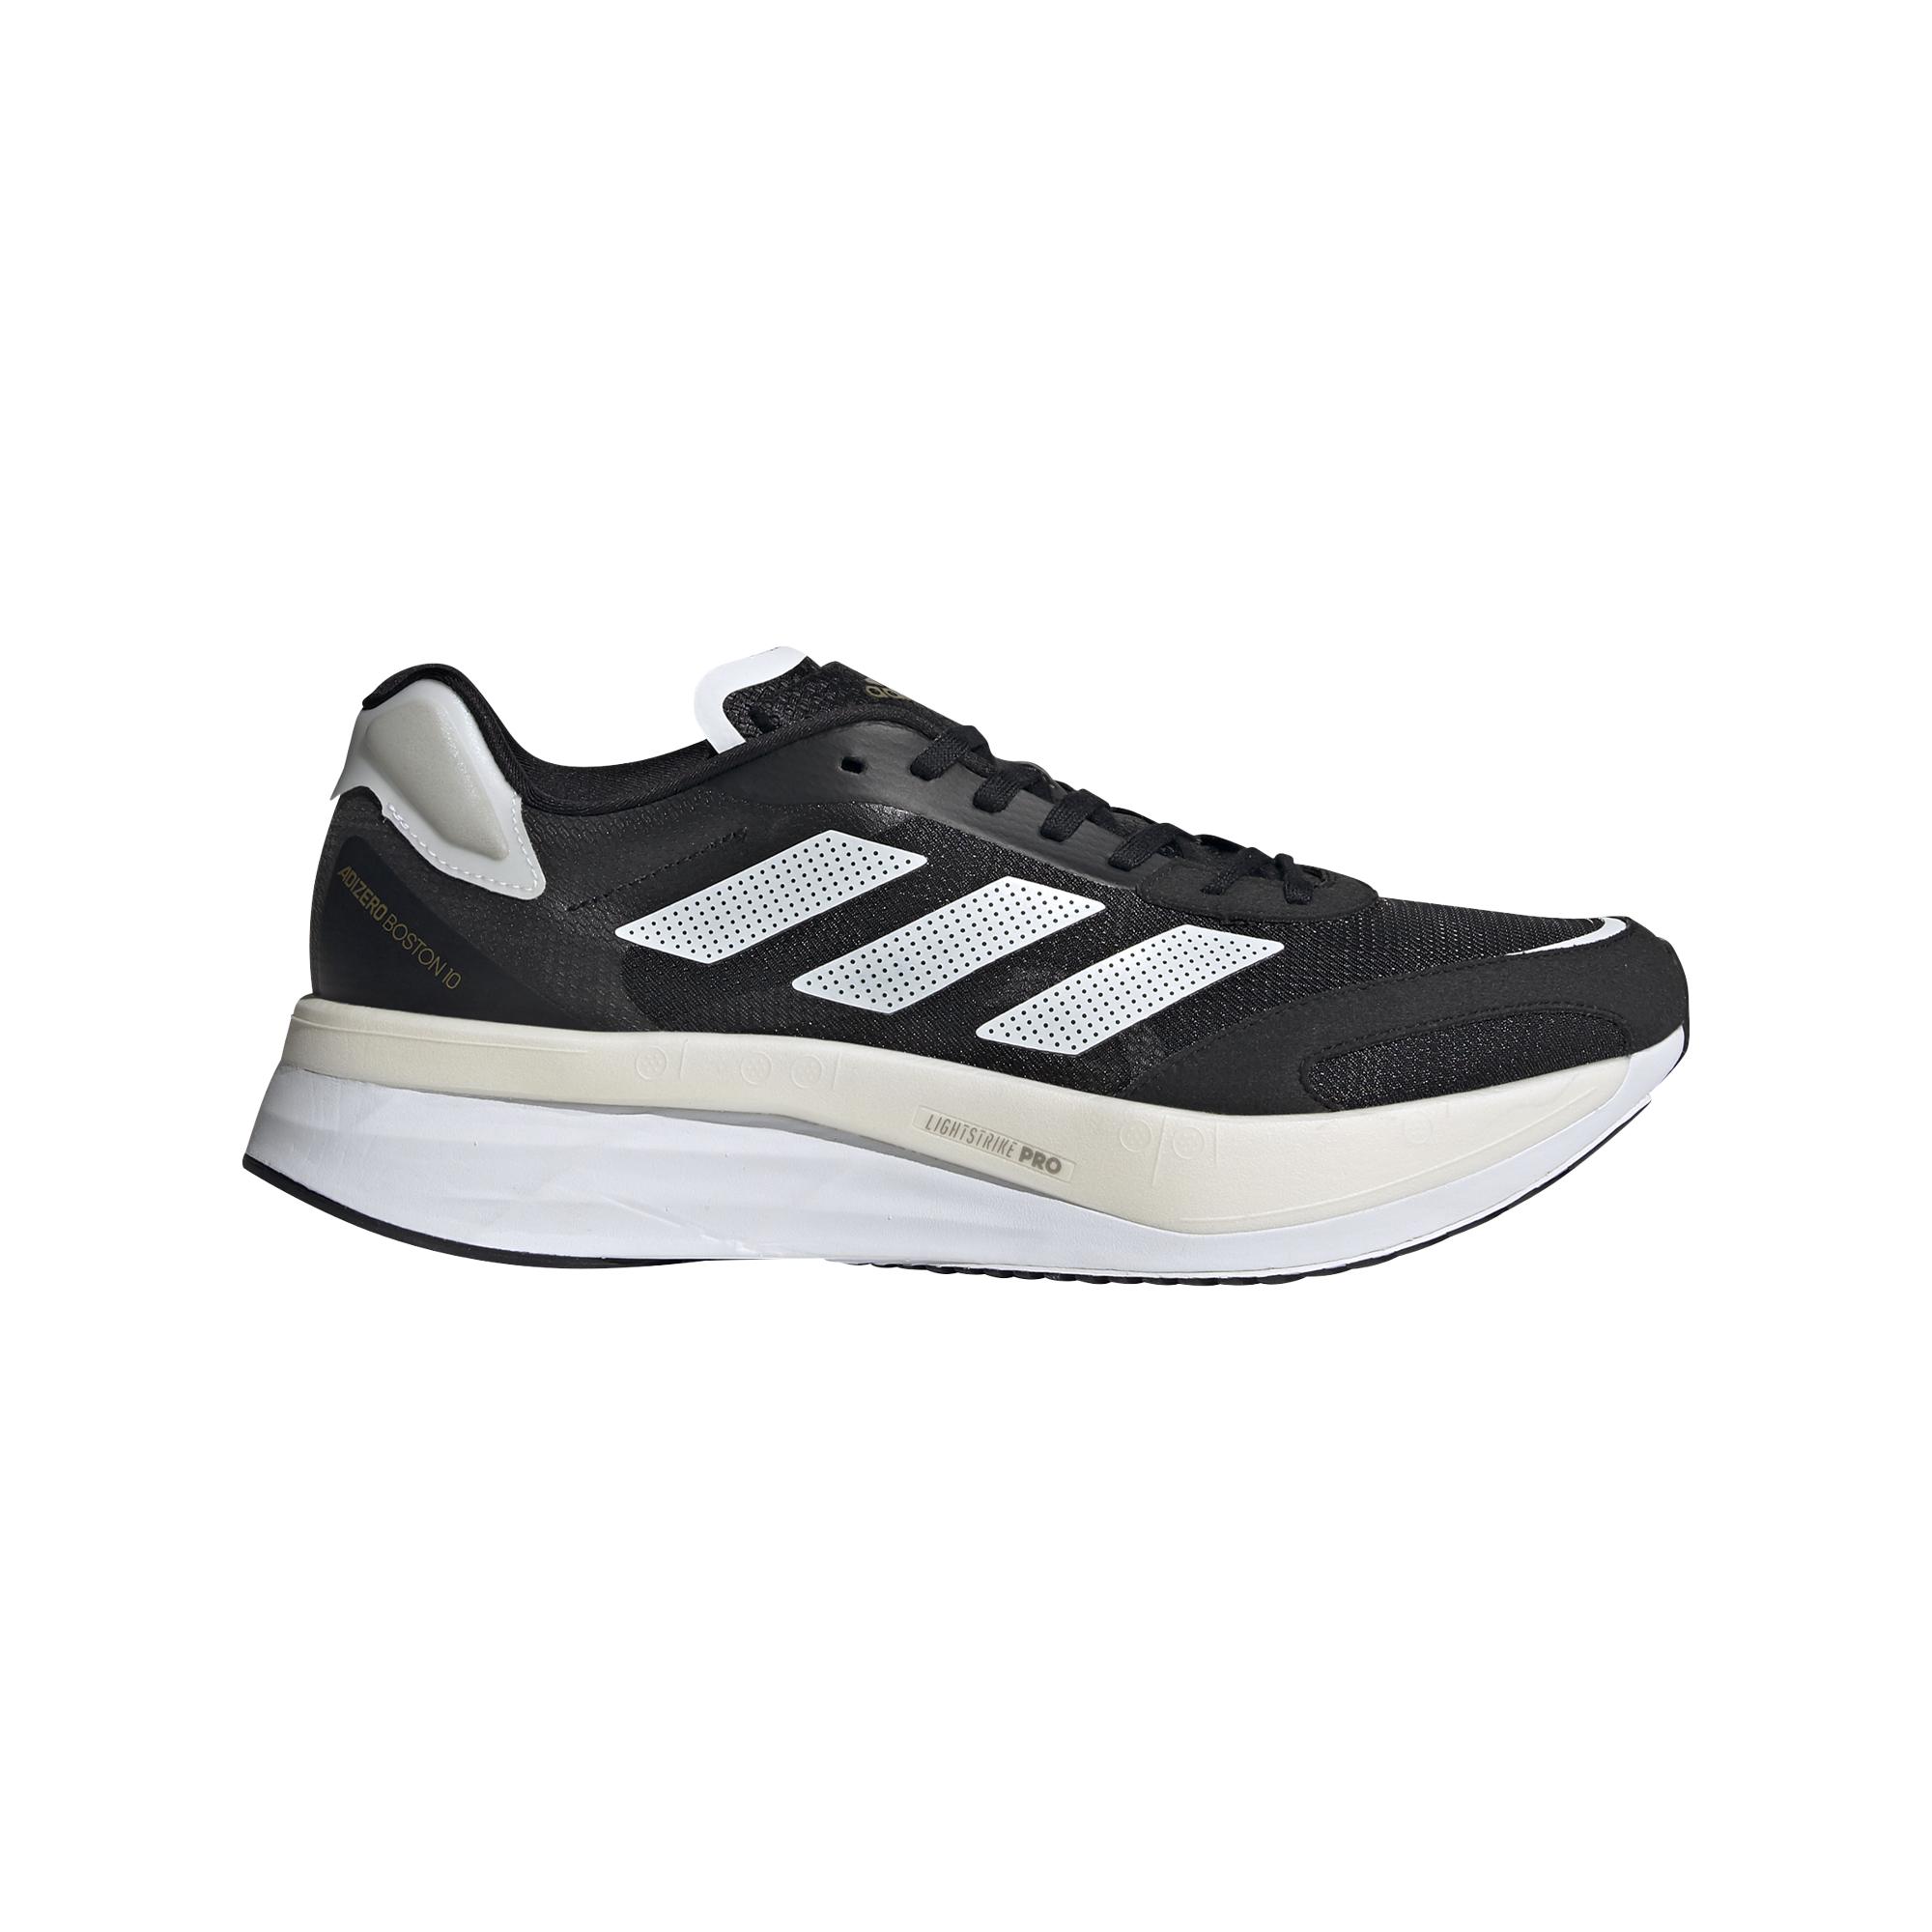 Men's Adidas Adizero Boston 10 Running Shoe - Color: Core Black / Cloud White / Gold Metallic - Size: 6.5 - Width: Regular, Core Black / Cloud White / Gold Metallic, large, image 1